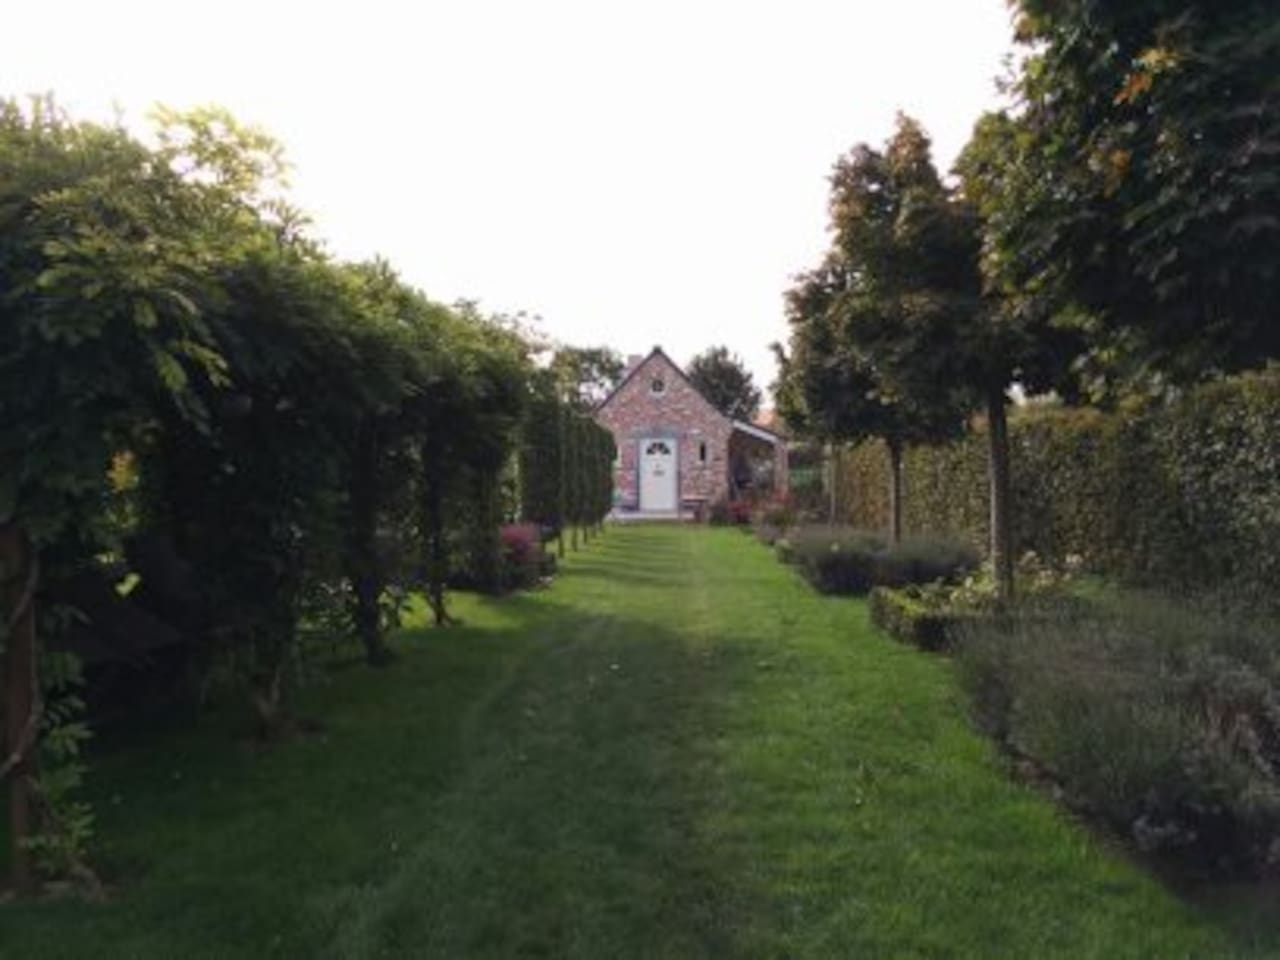 Au fond du jardin